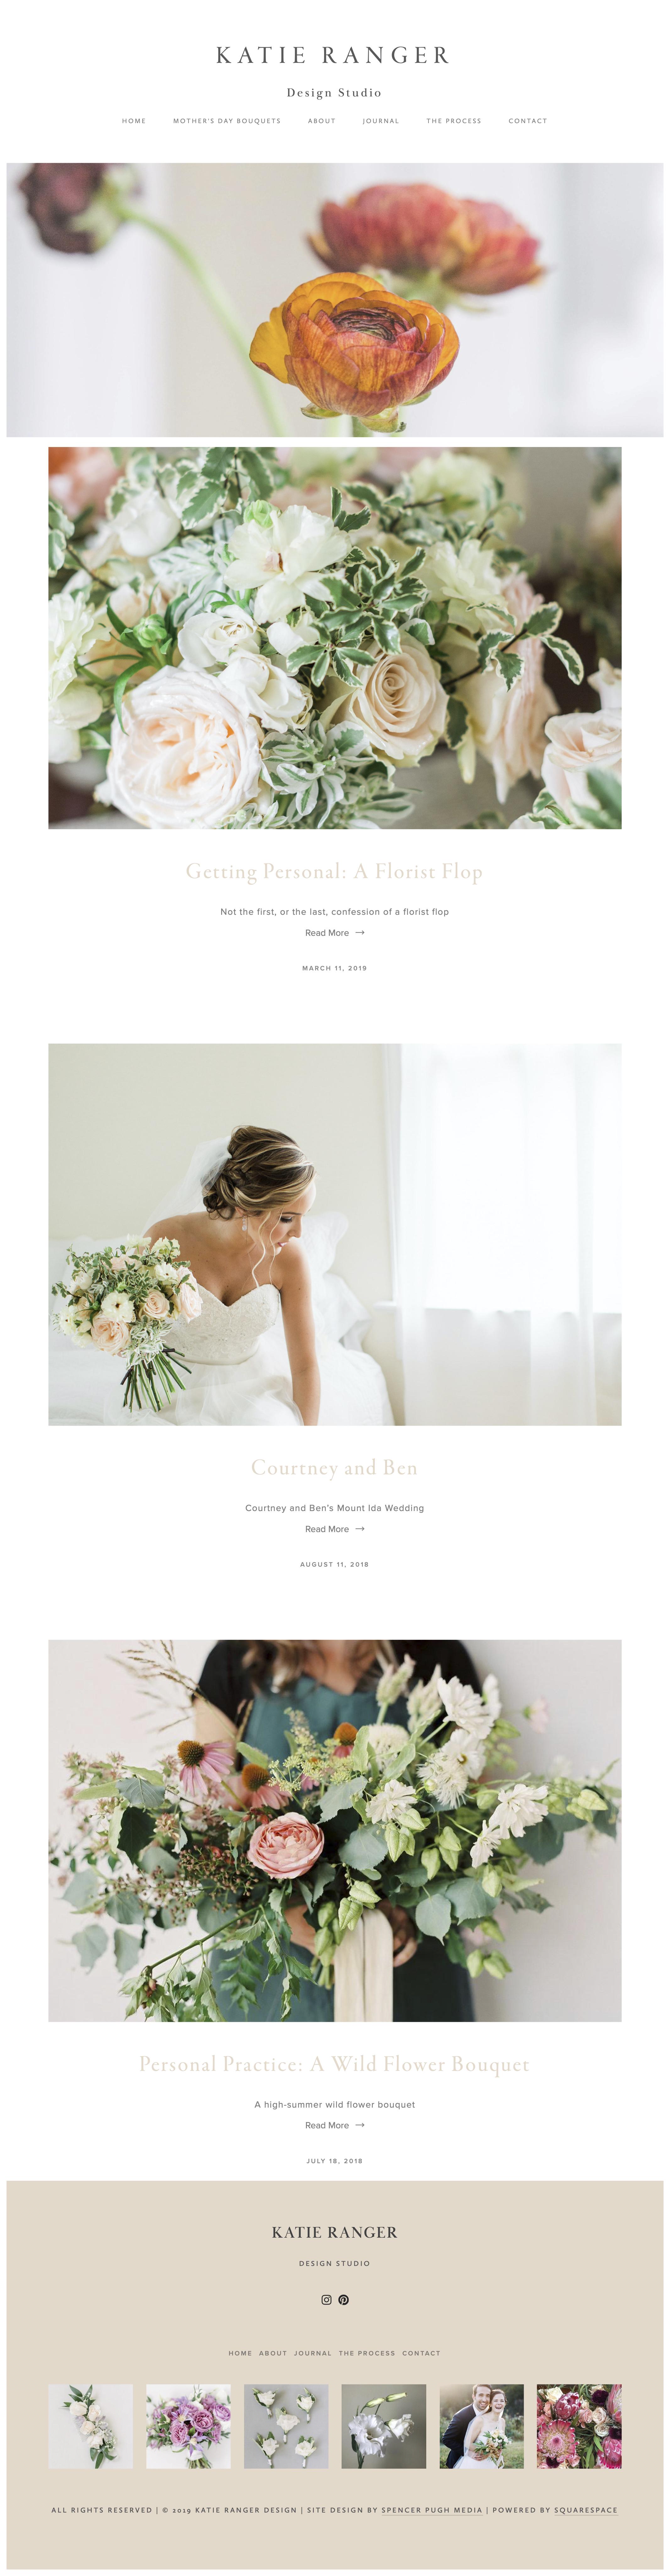 Journal — Katie Ranger.jpg